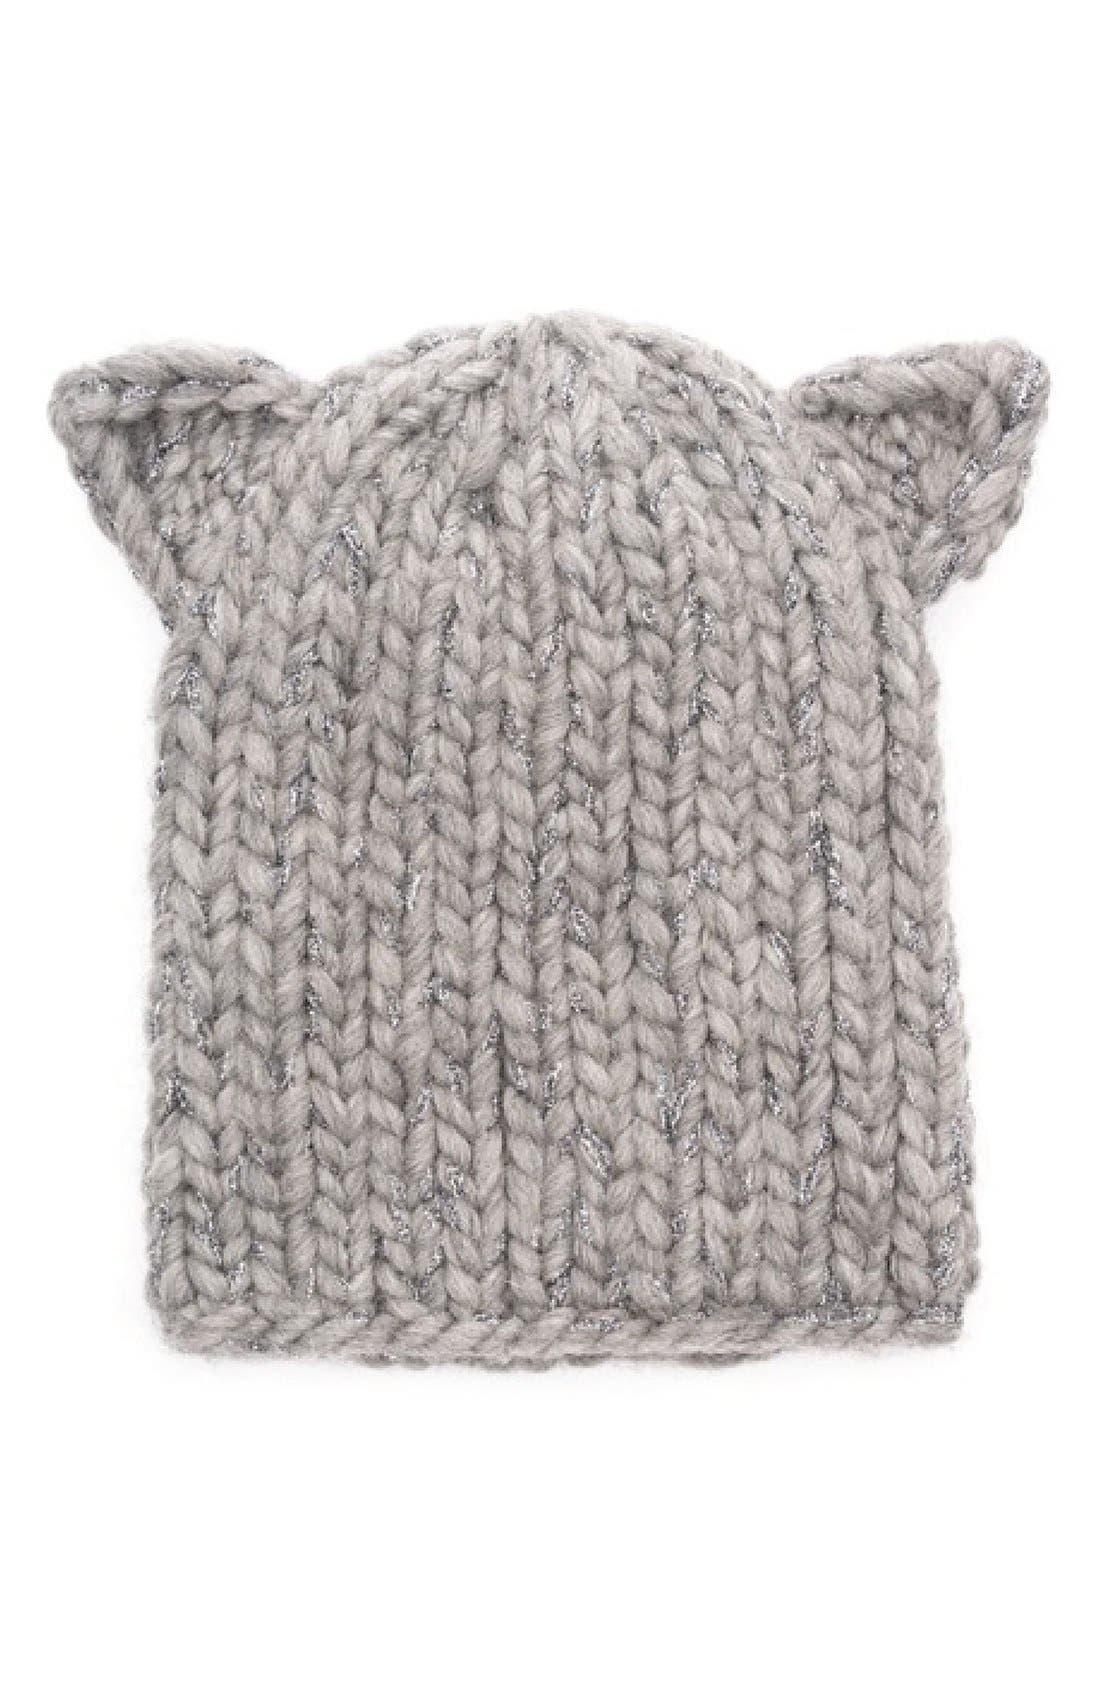 Alternate Image 1 Selected - Eugenia Kim 'Felix' Wool Blend Beanie